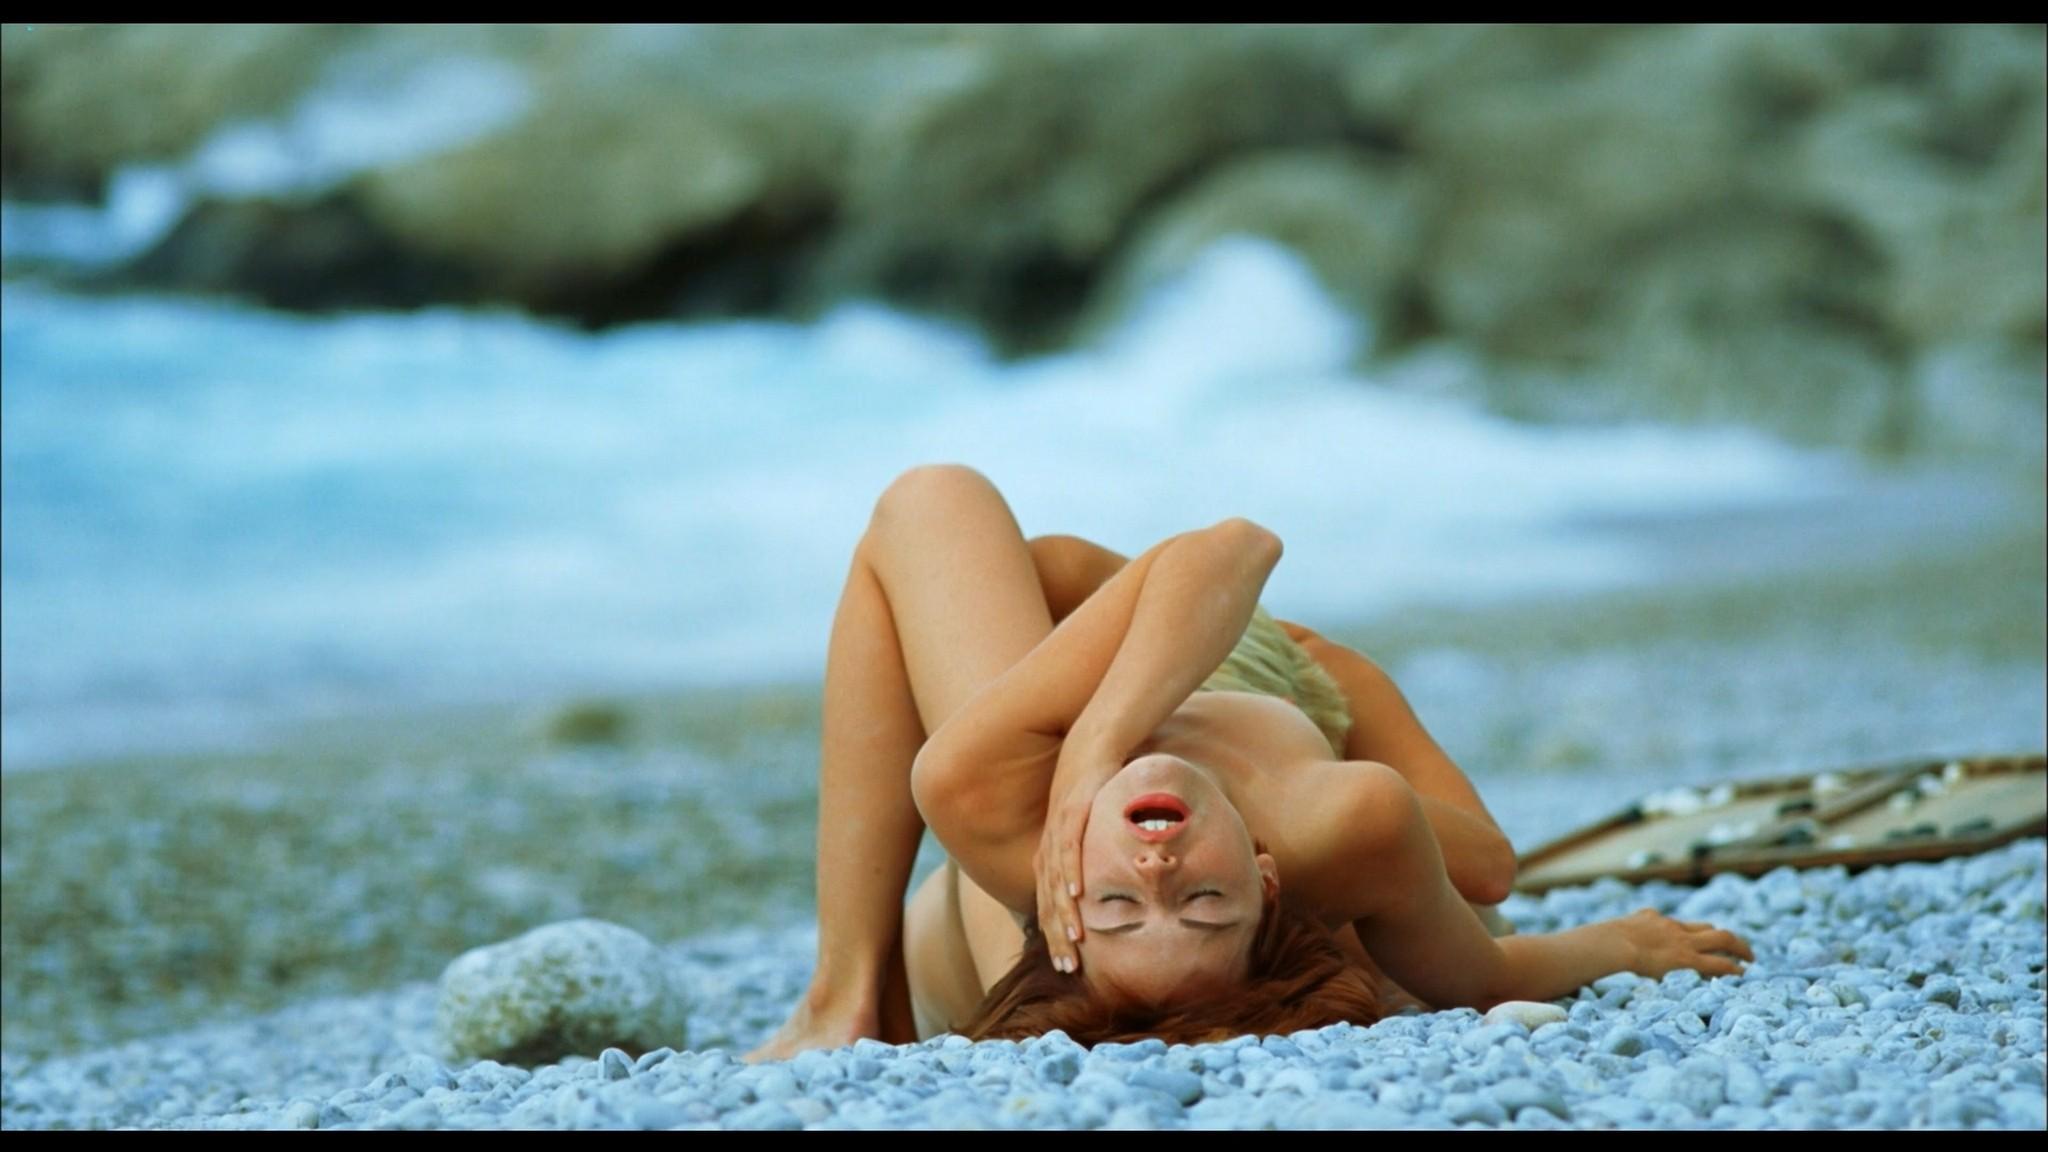 Avalon Barrie nude and Lyudmila Shiryaeva nude full frontal Sappho 2008 HD 1080p BluRay REMUX 16